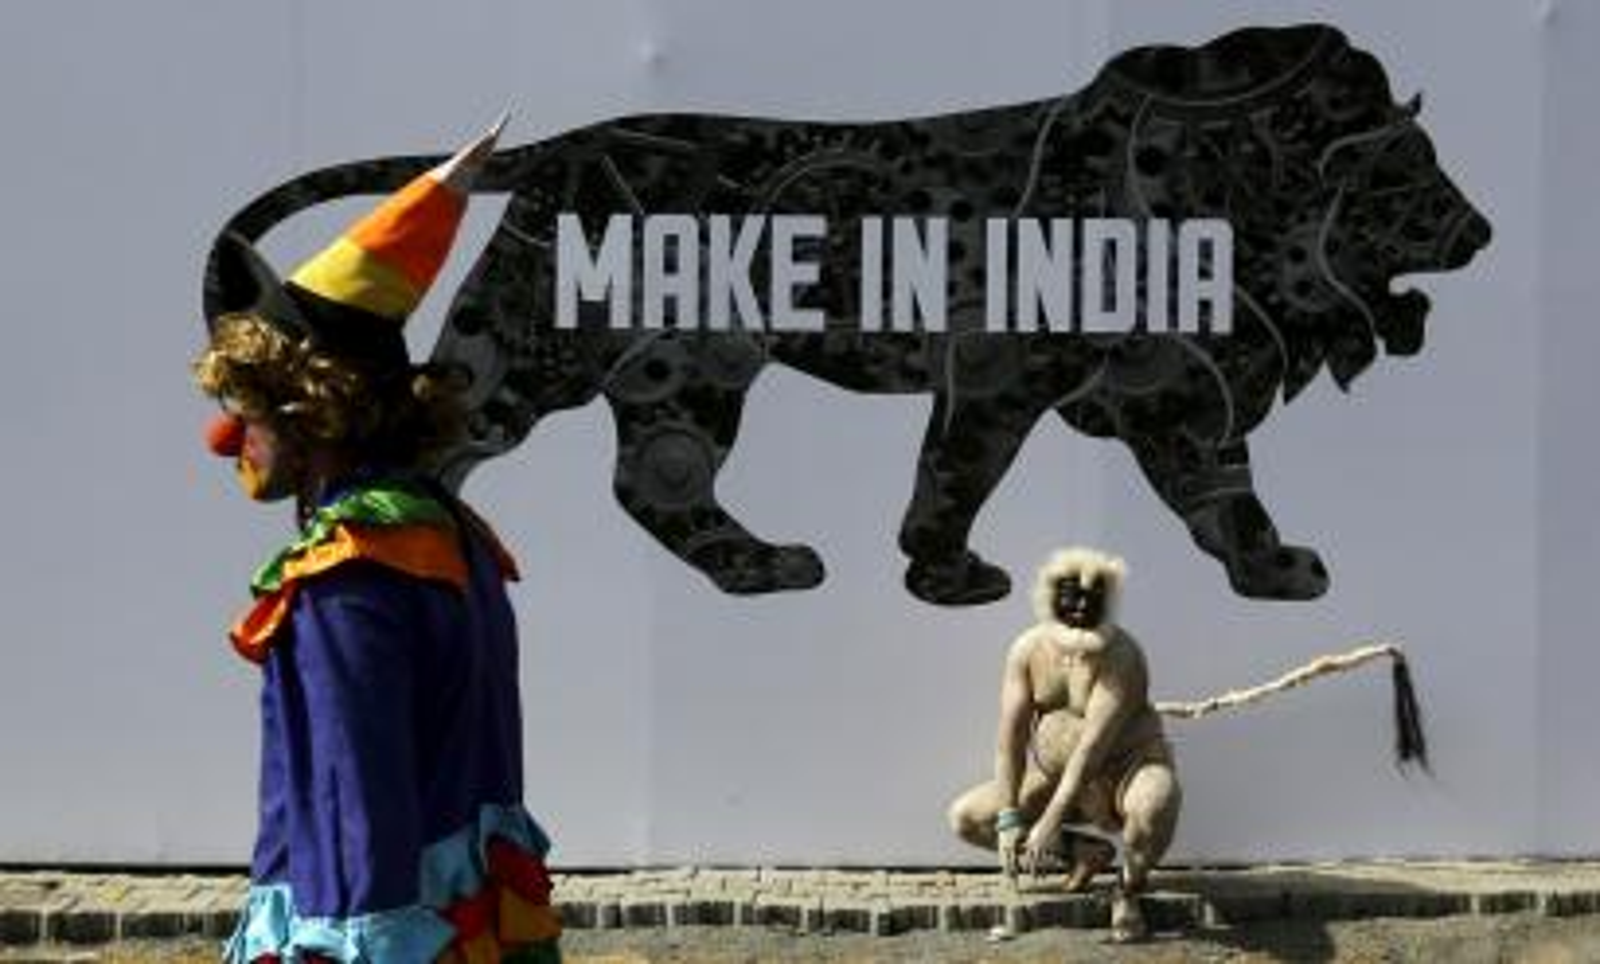 india-make-in-india